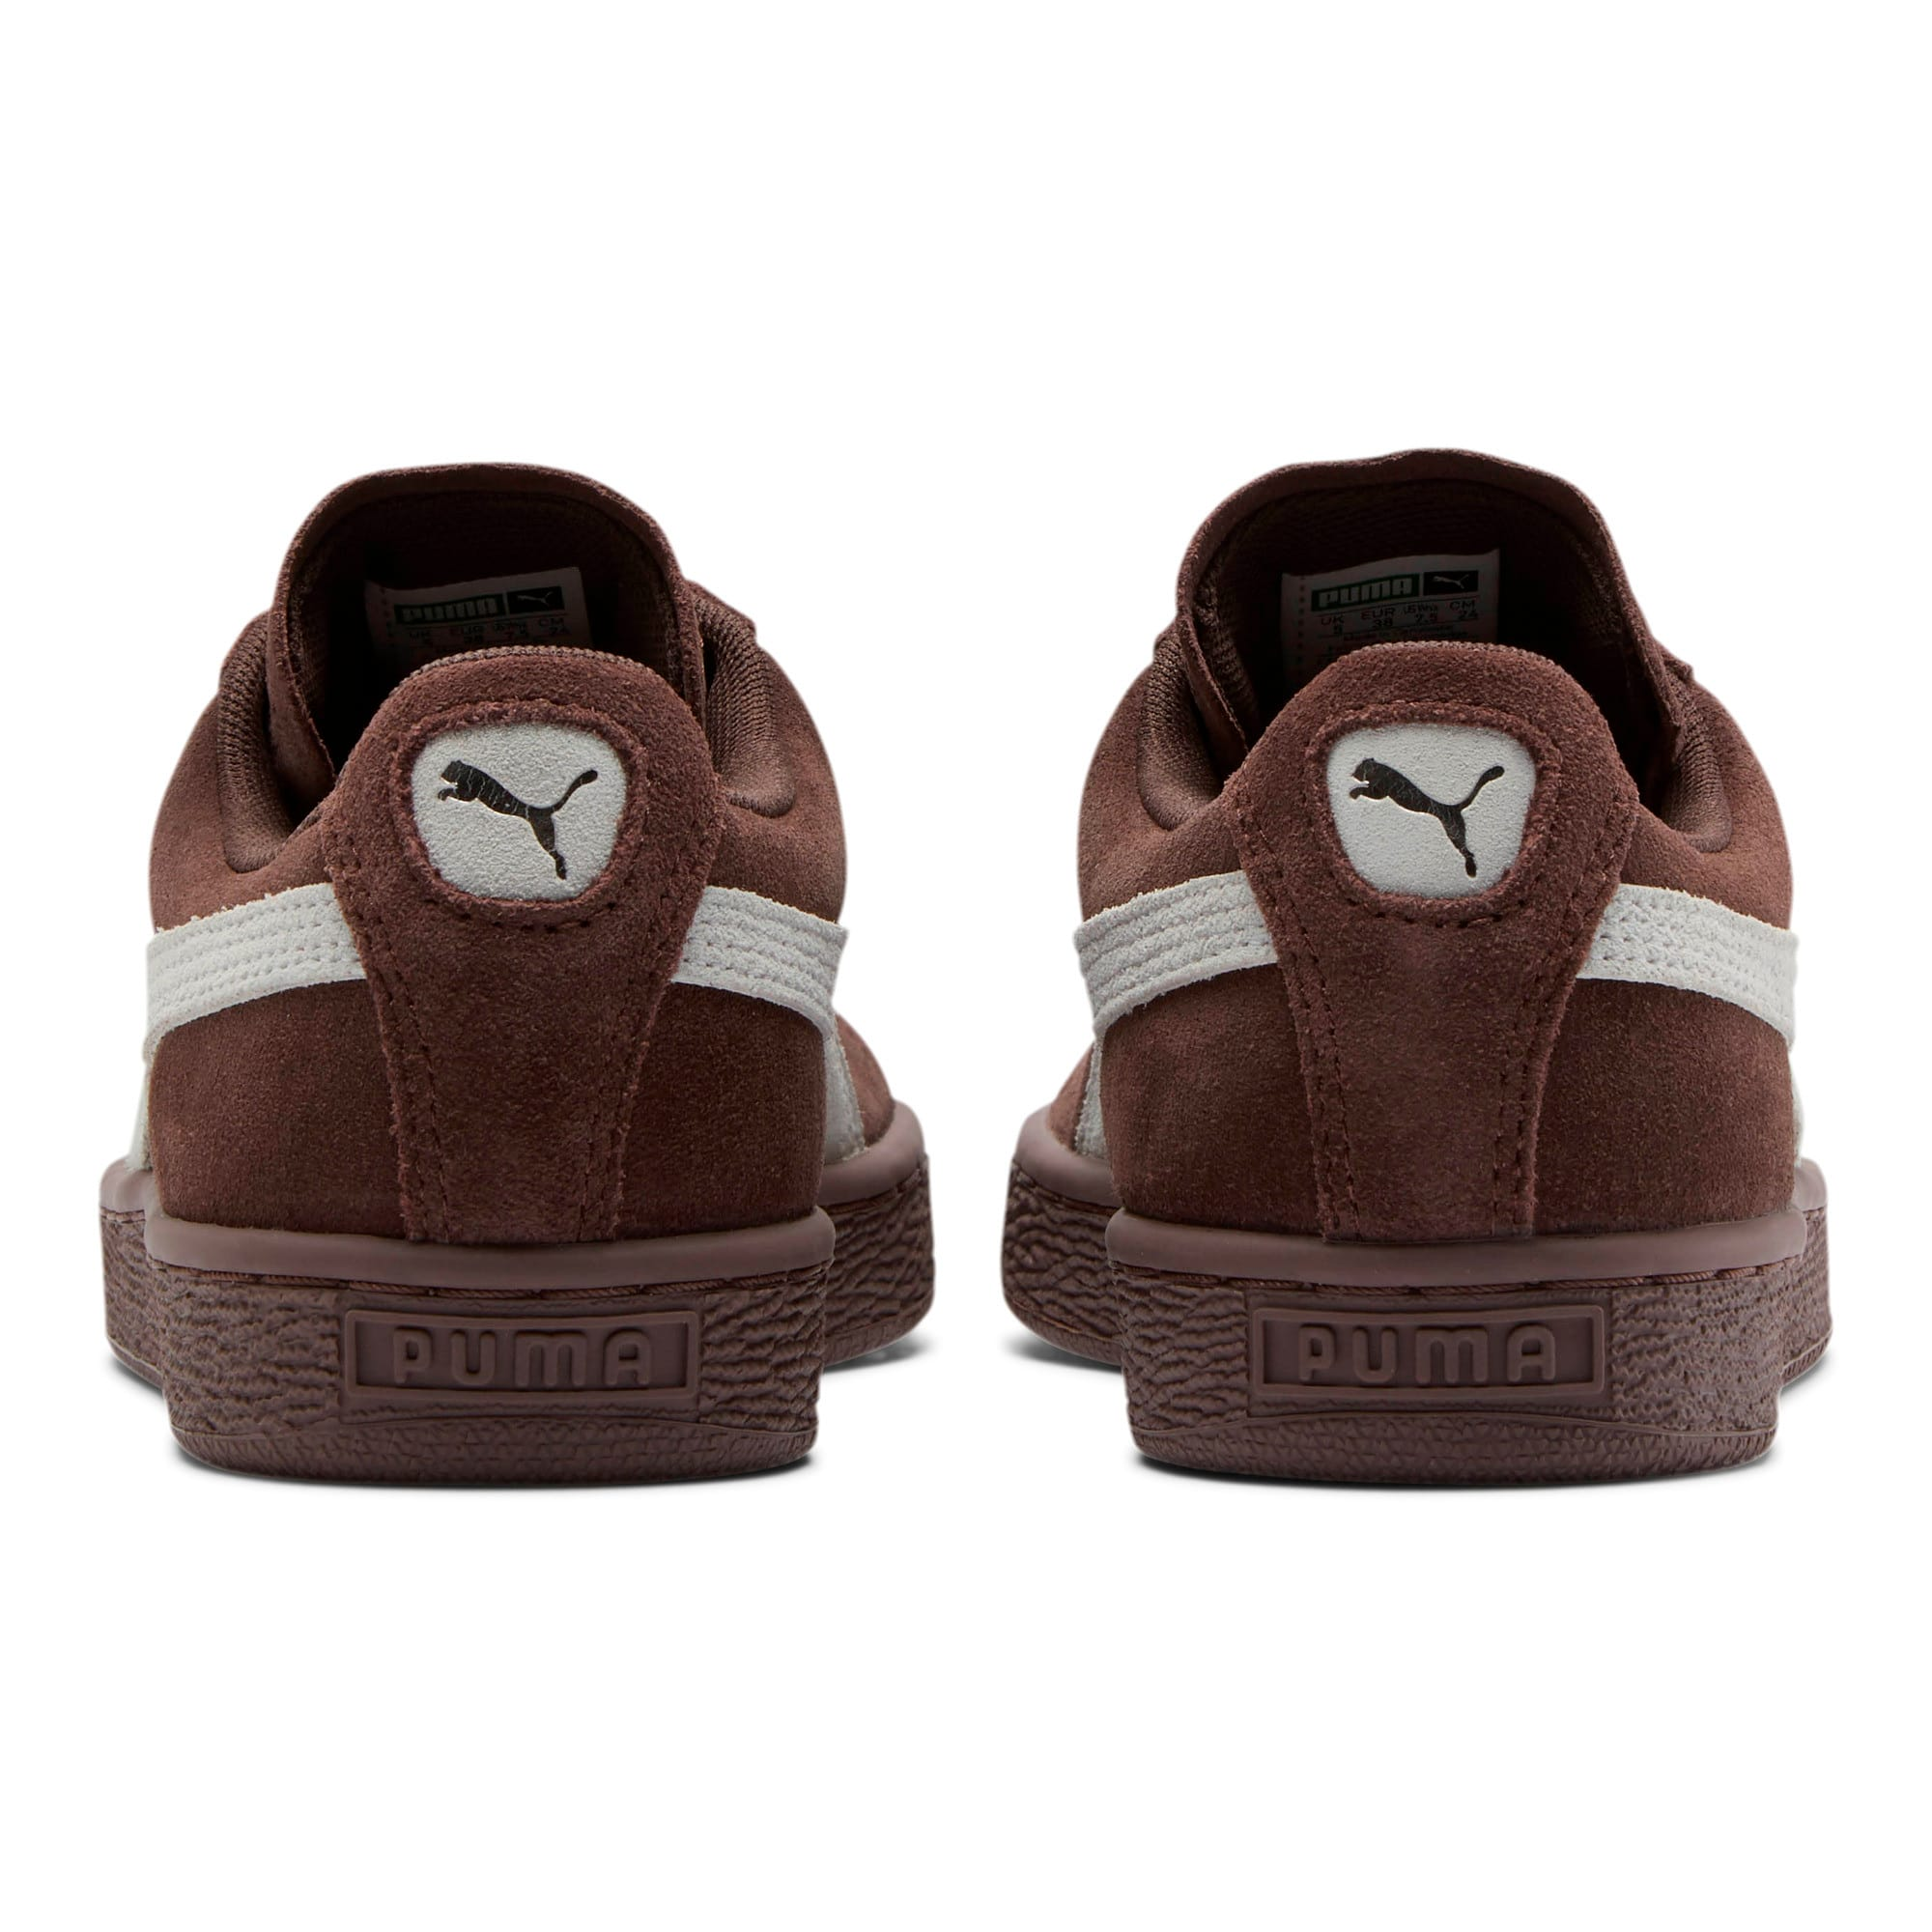 Thumbnail 4 of Suede Classic Women's Sneakers, Peppercorn-Puma White, medium